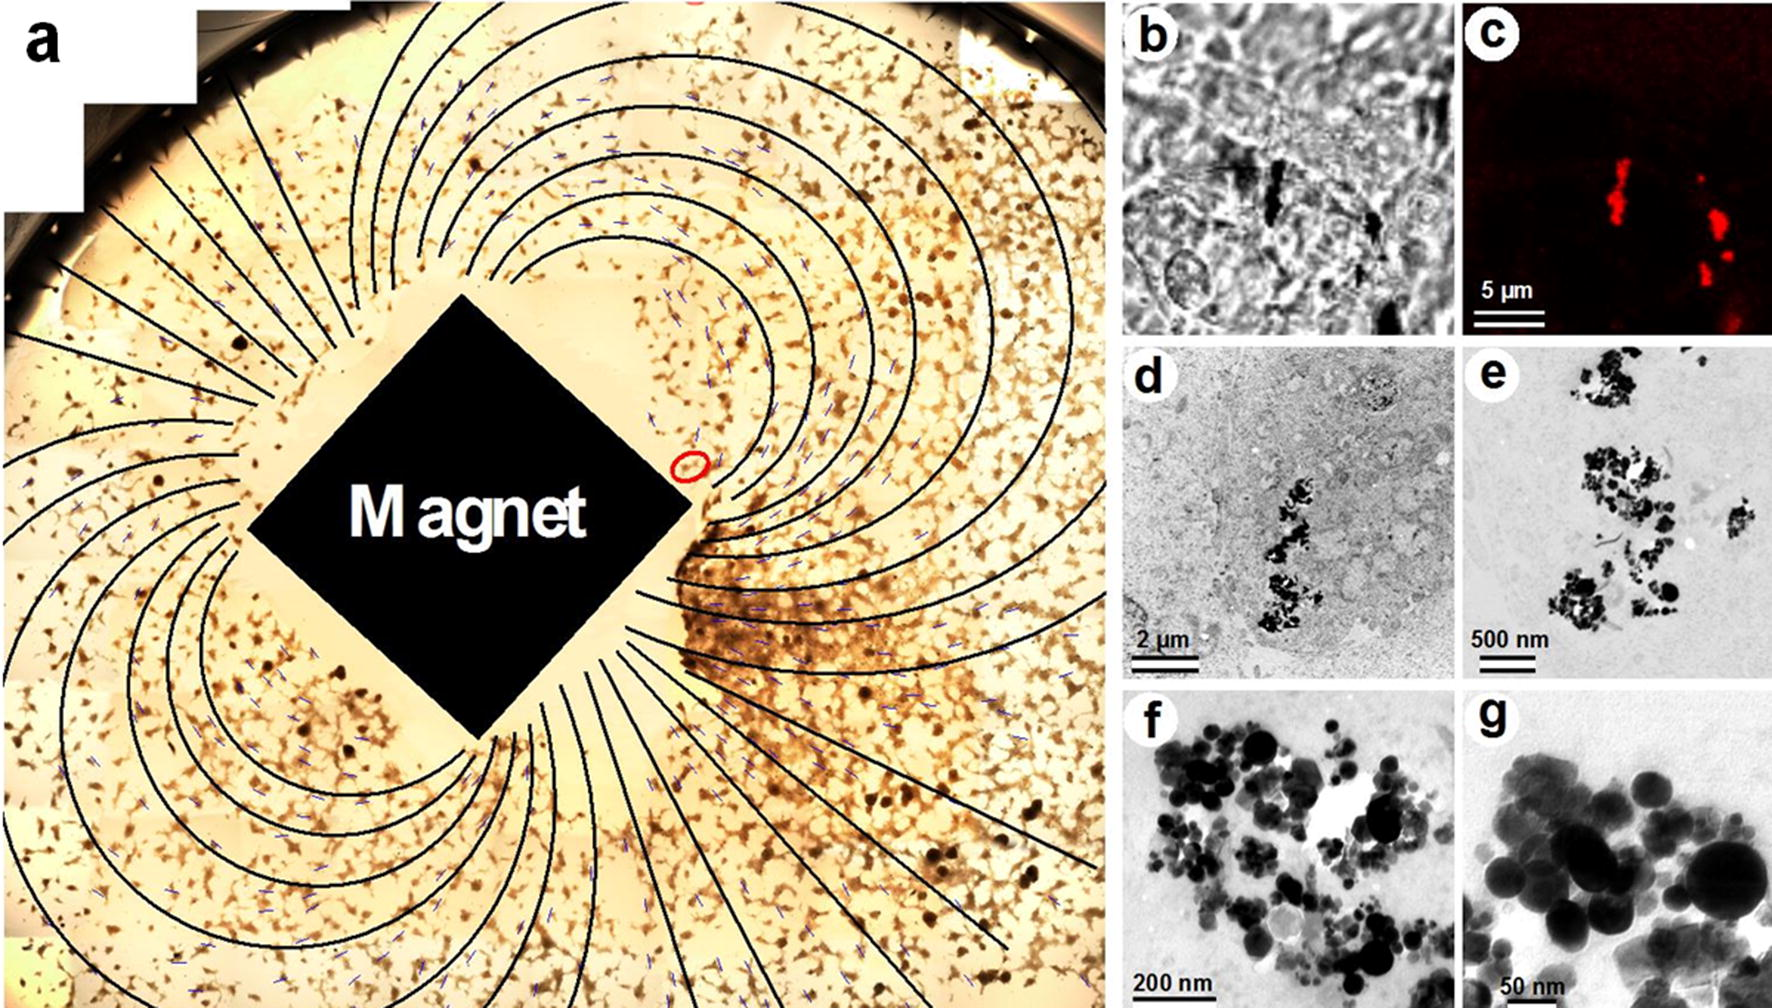 Long-term live cells observation of internalized fluorescent